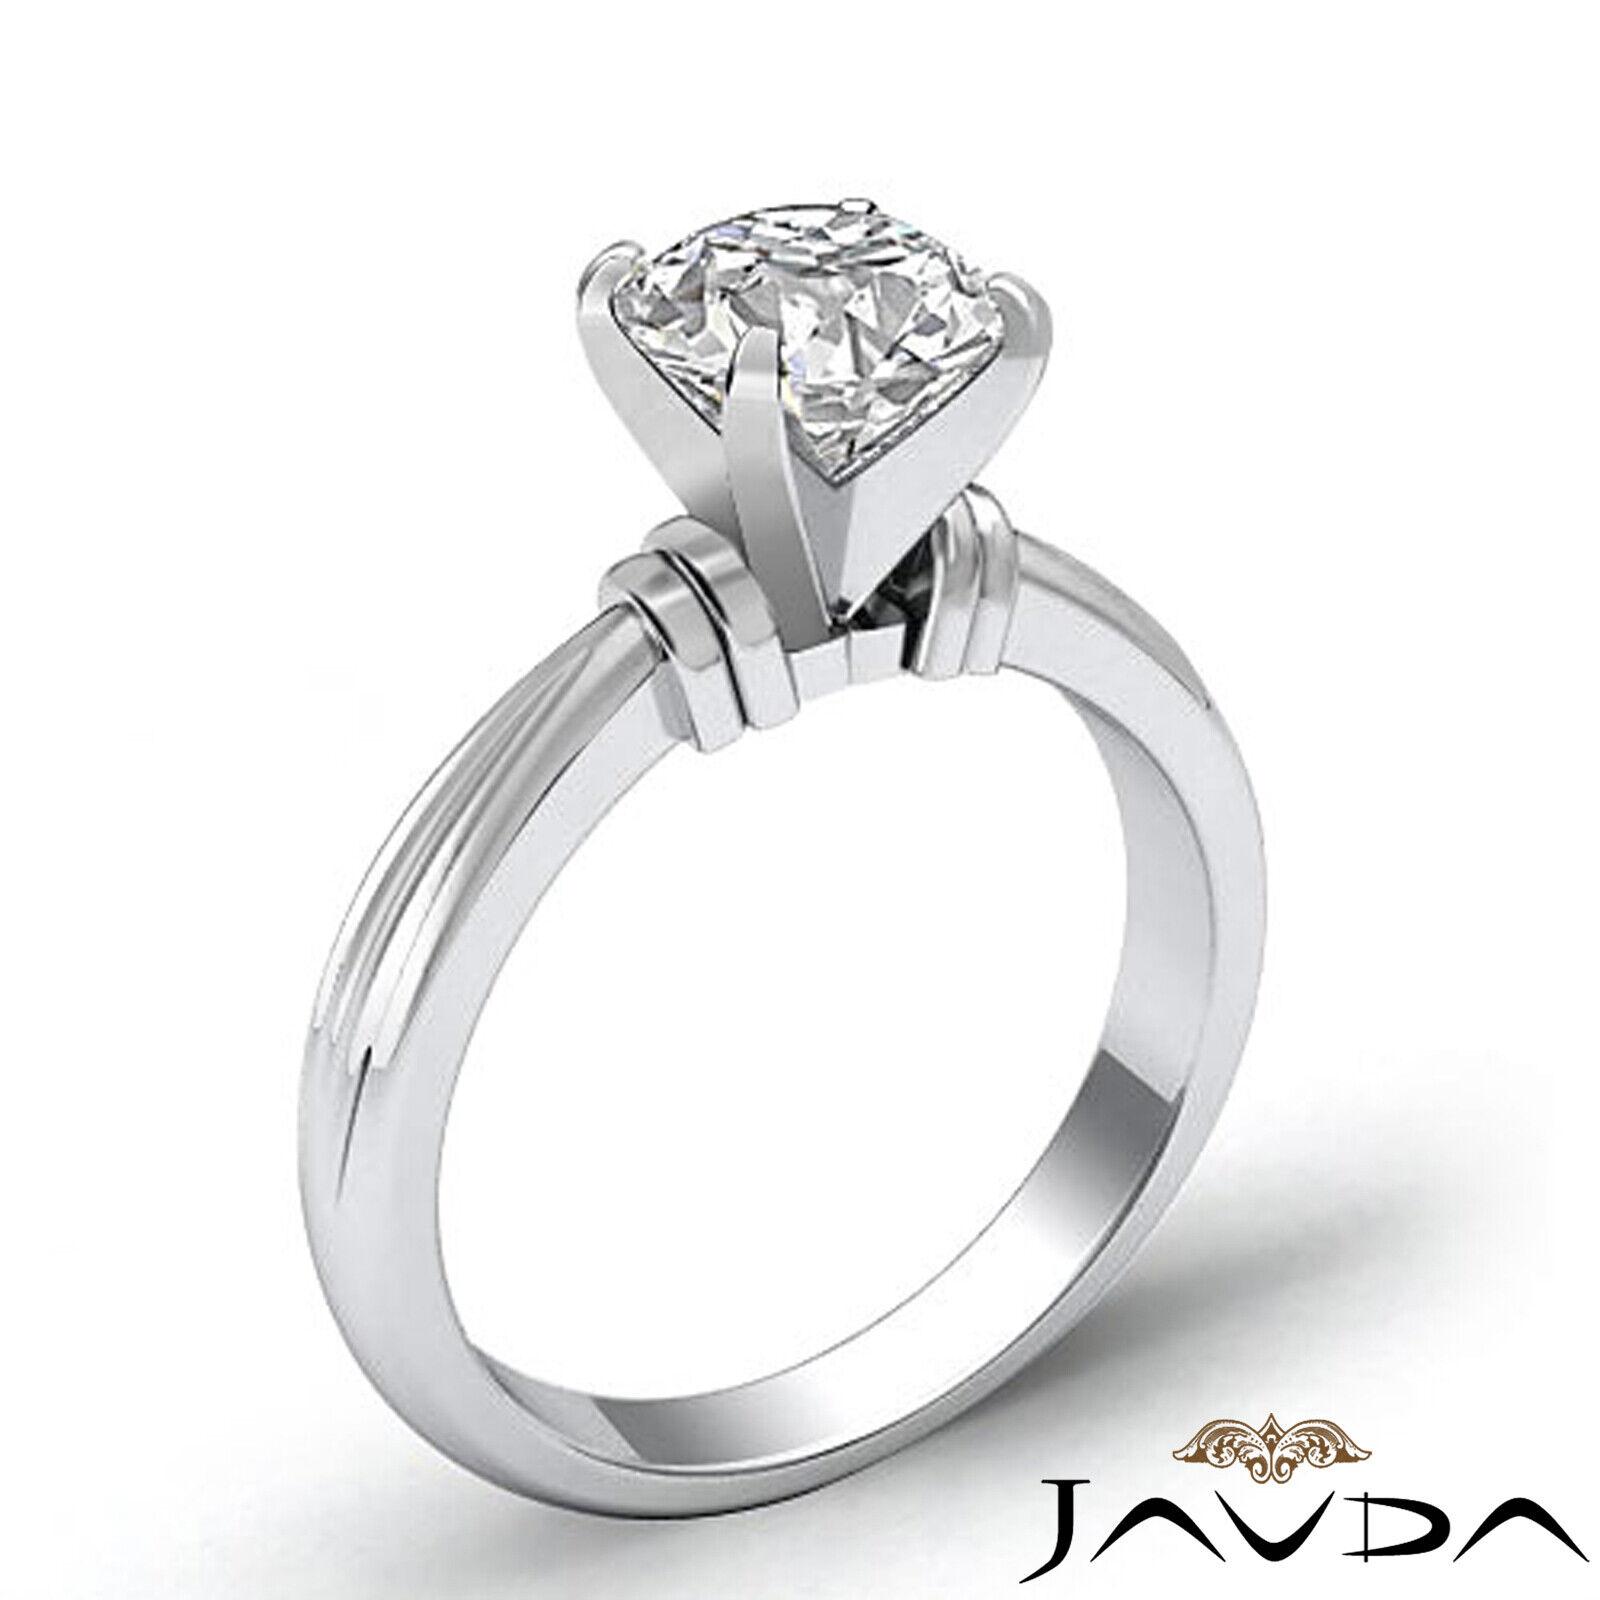 Round Solitaire Natural GIA H Color VVS2 Diamond Women's Engagement Ring 1 ctw. 2